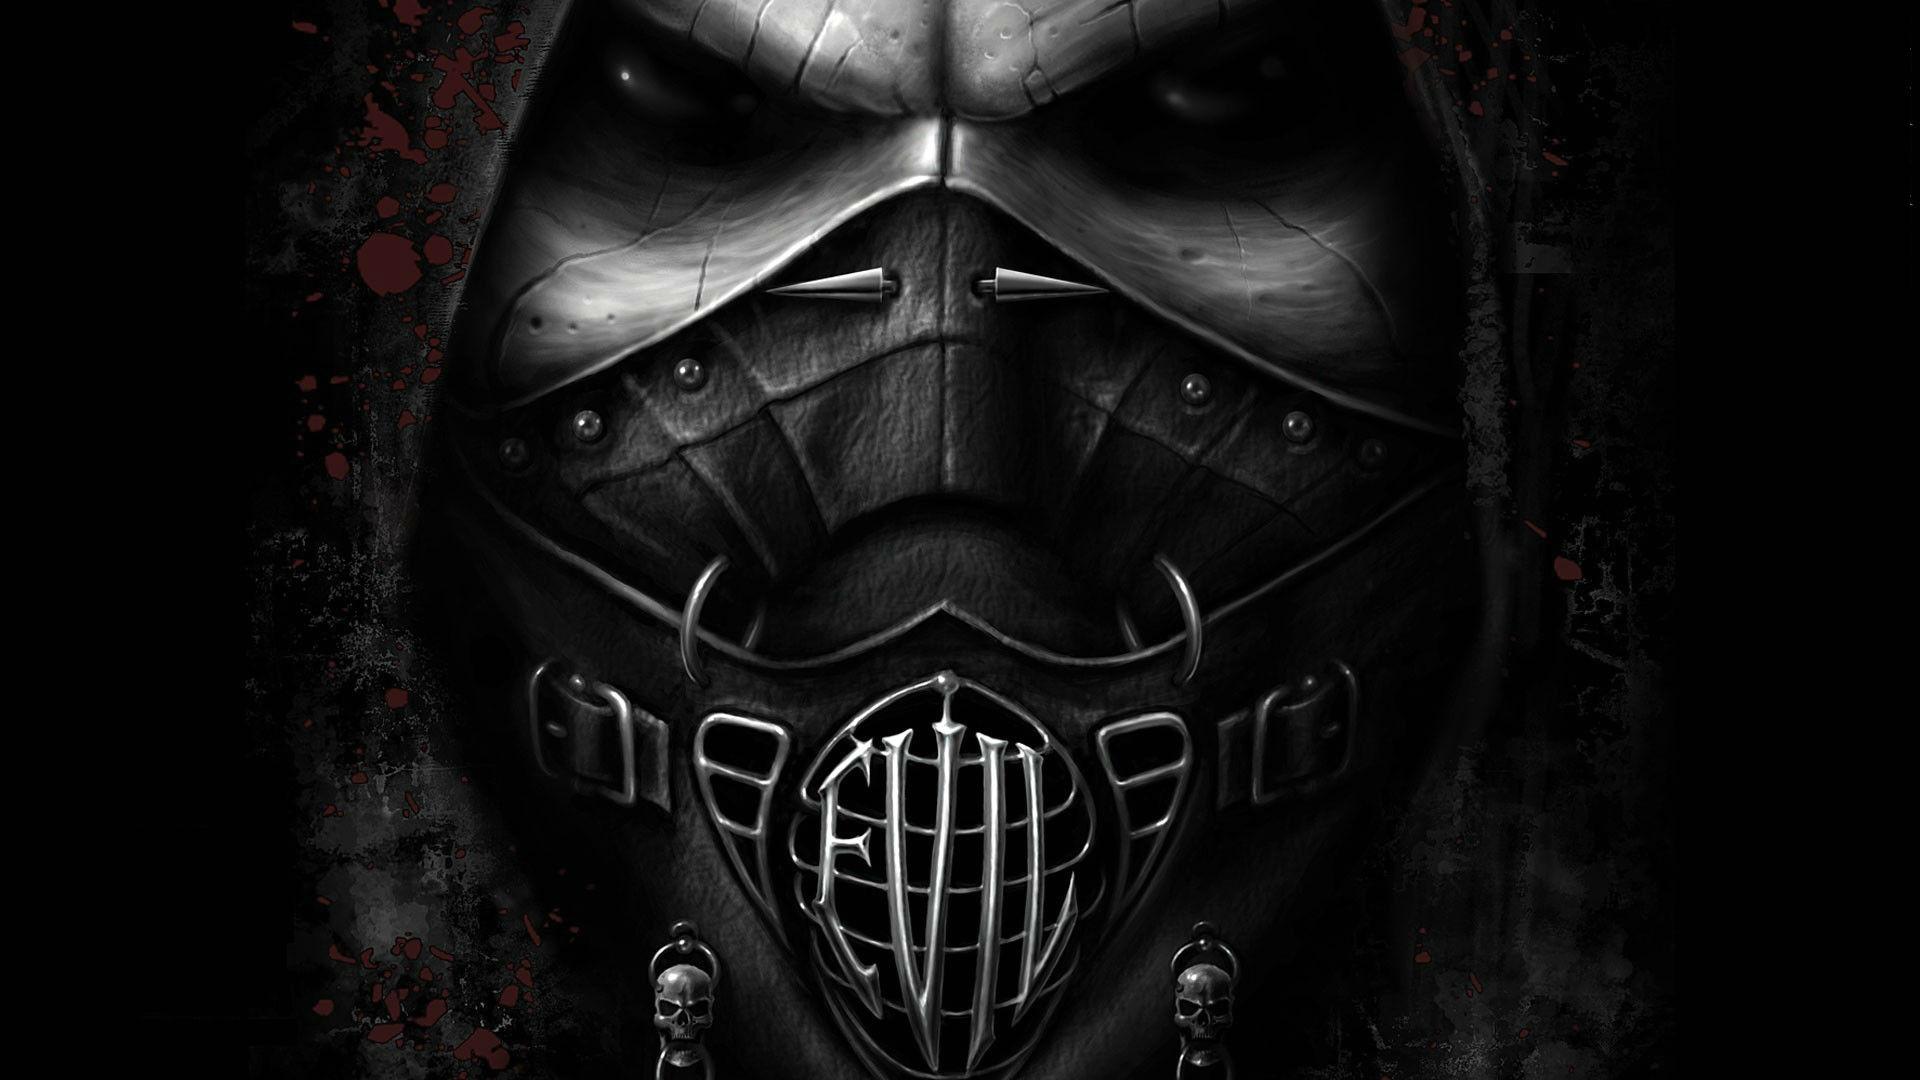 Dark horror mask evil gothic face eyes wallpaper 1920x1080 30329 1920x1080